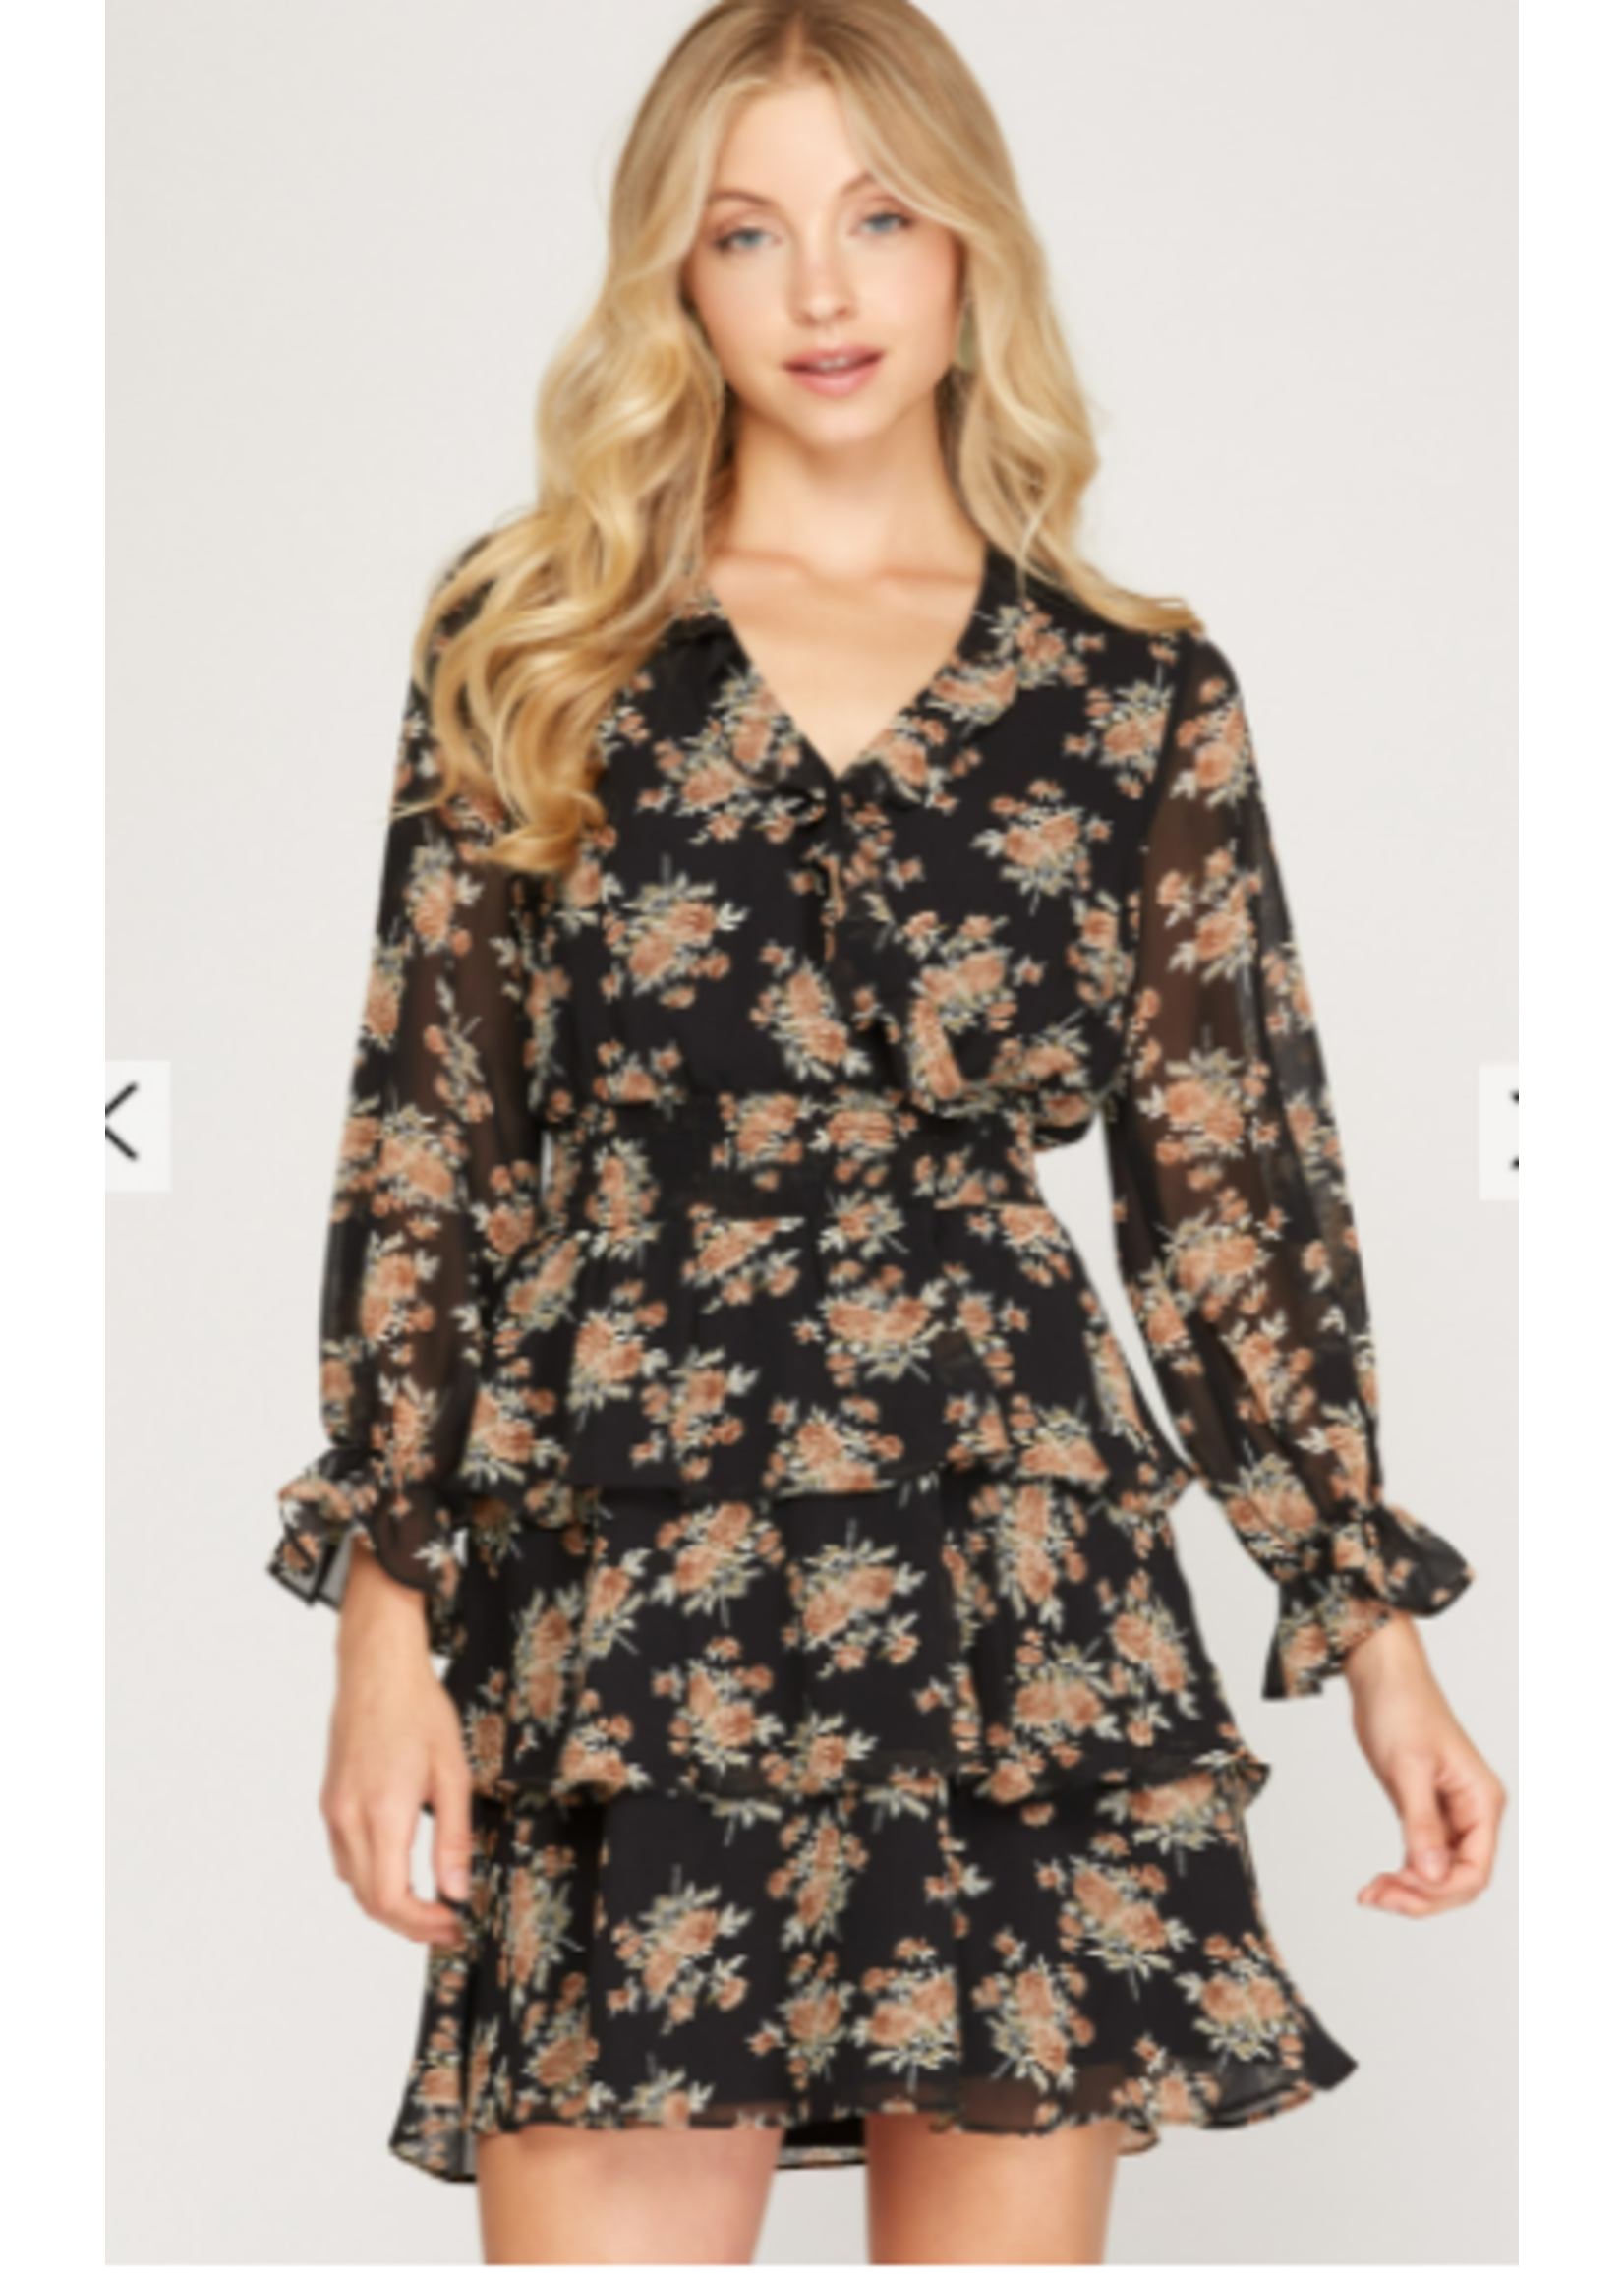 She & Sky Black Rose Dress